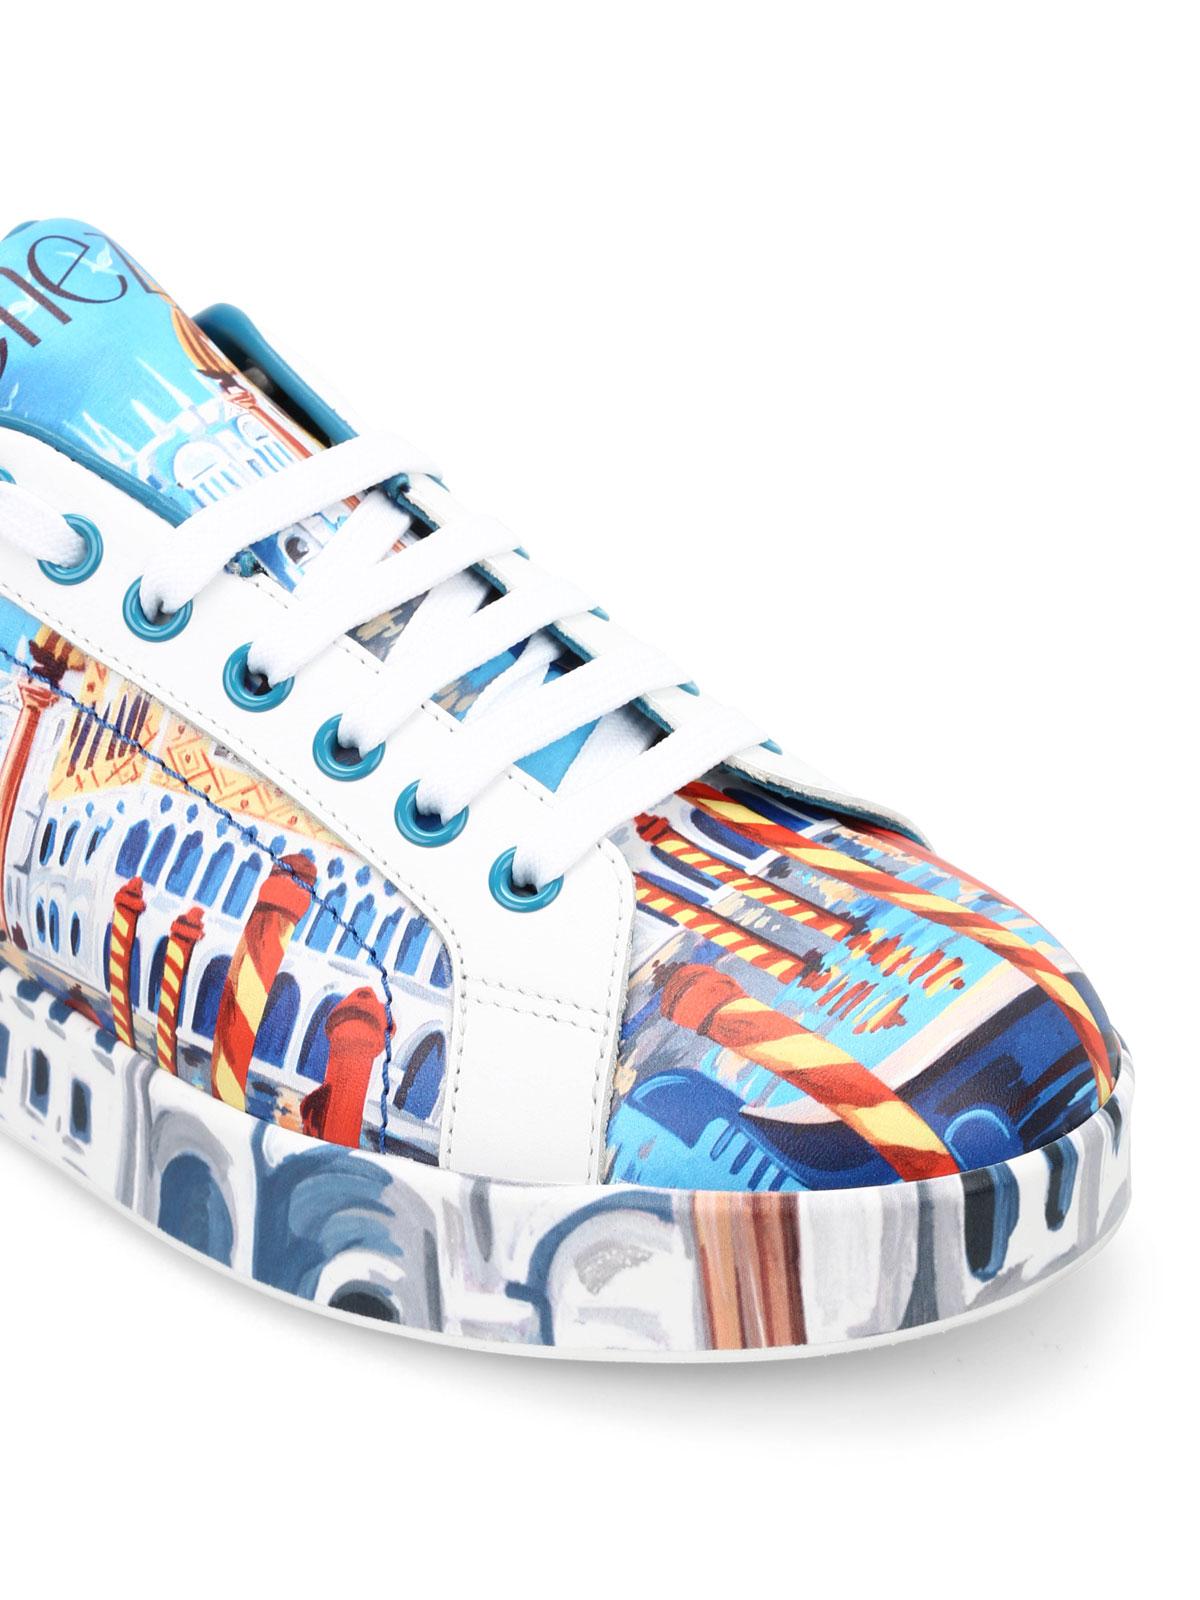 Dolce & Gabbana Italia Is Love Sportschuhe Sneaker